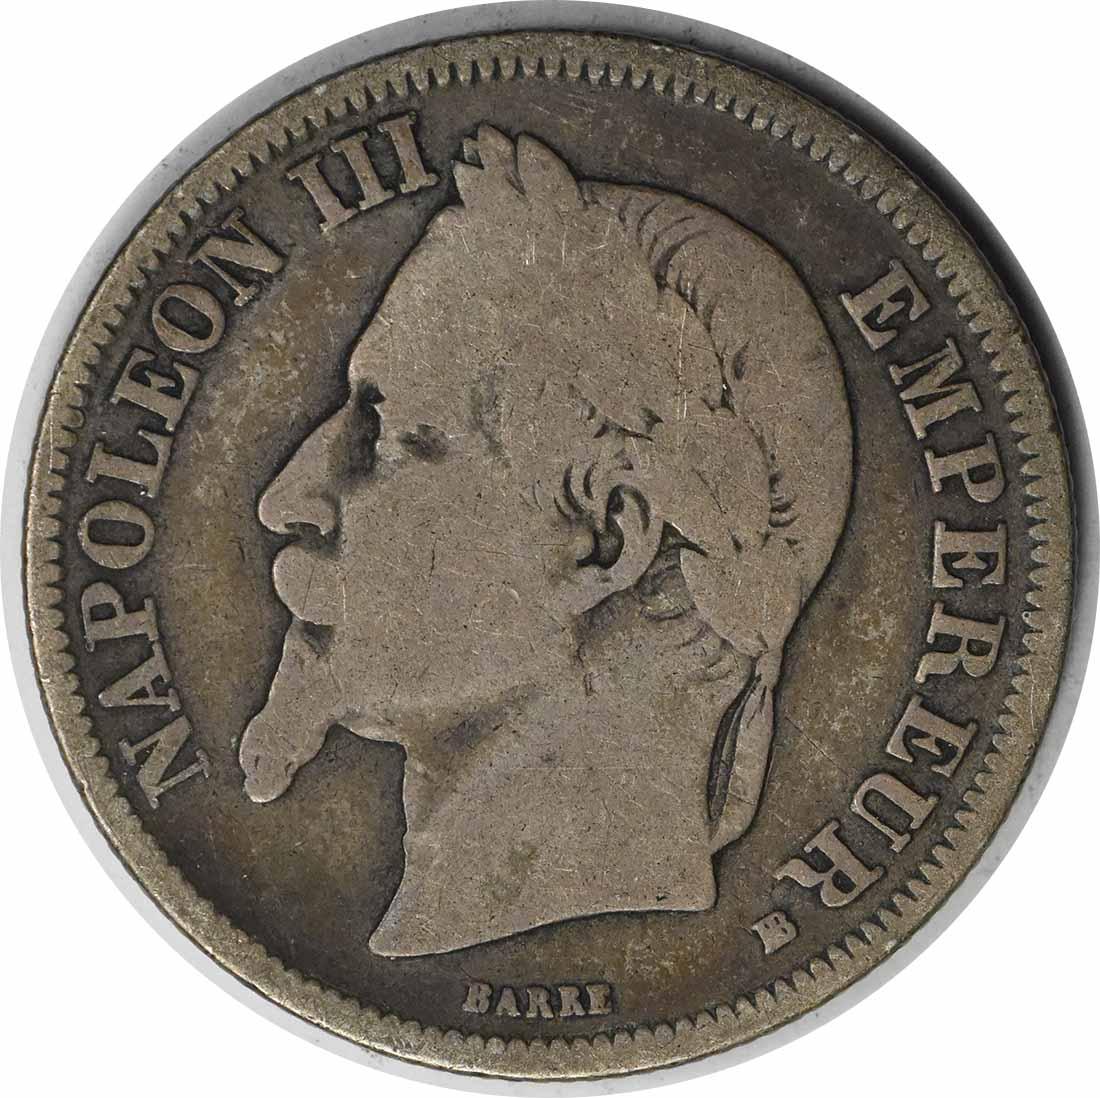 1868 BB France 2 Francs KM807.2 F Uncertified